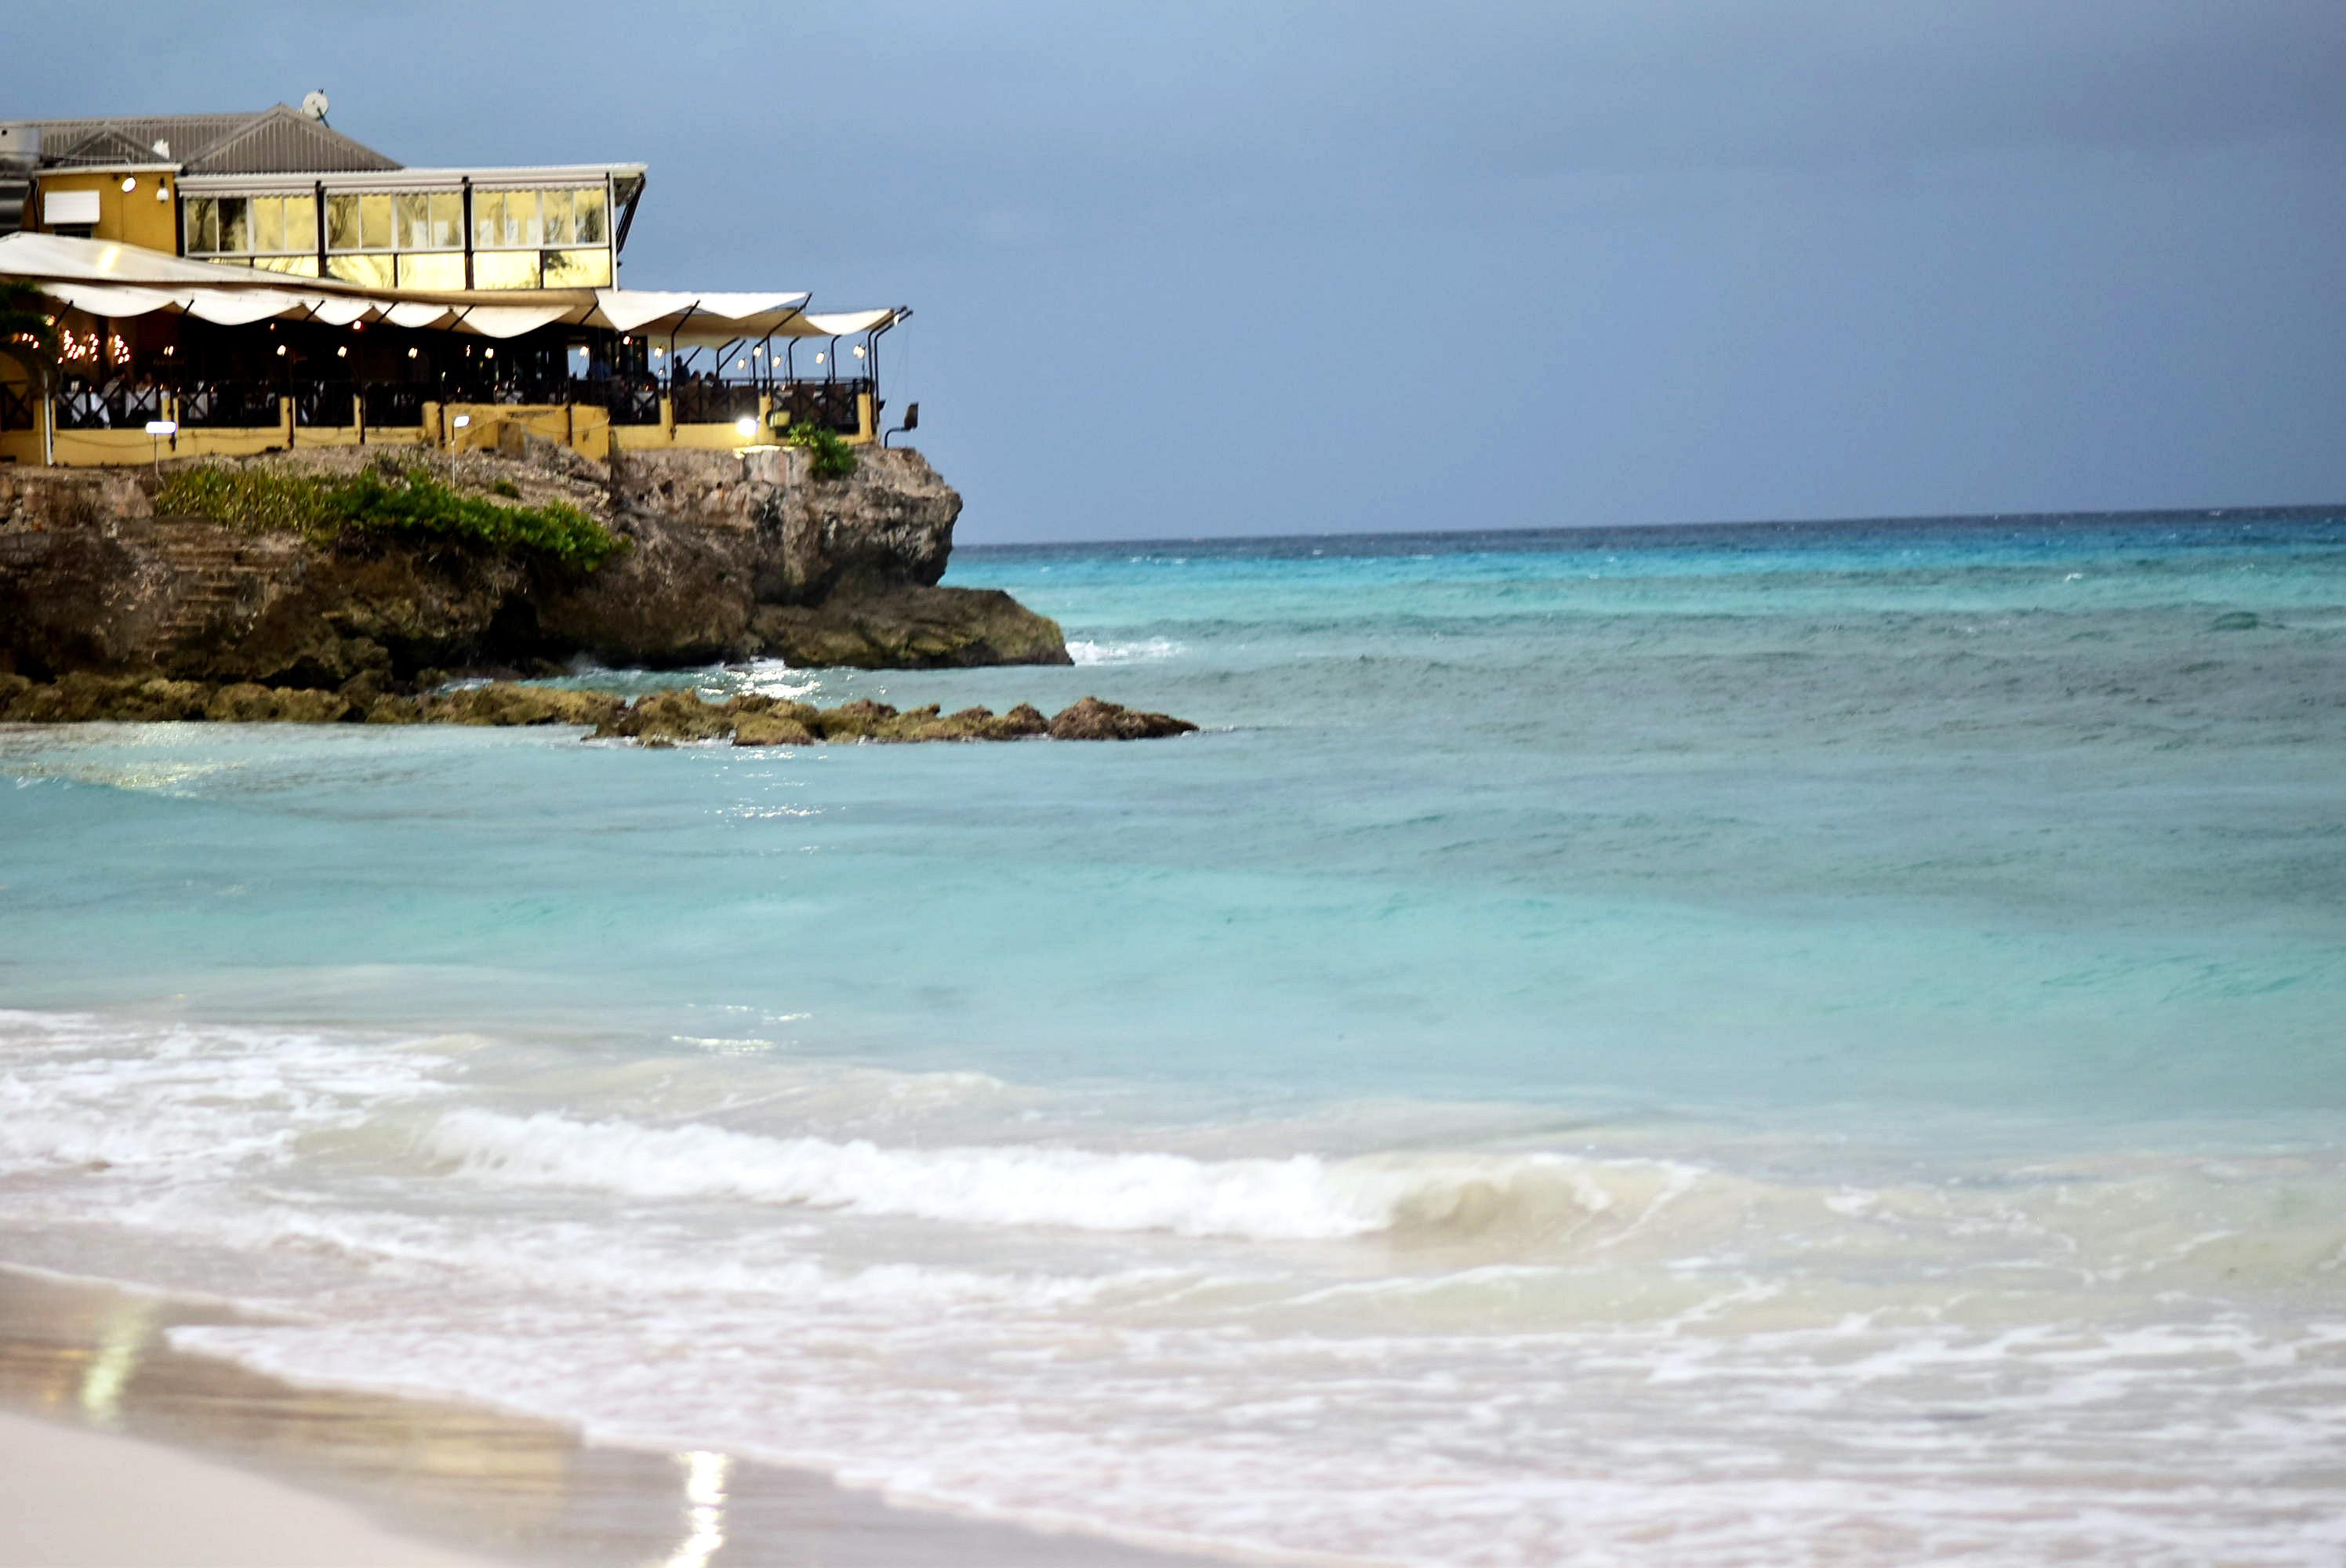 Tommeezjerry-Männerblog-Berlinblog-Fashionblog-Styleblog-Travelblog-Travel-Reiseblog-Reisen-Barbados-Karibik-Carribean-Summer-Sommer-Vacation-7